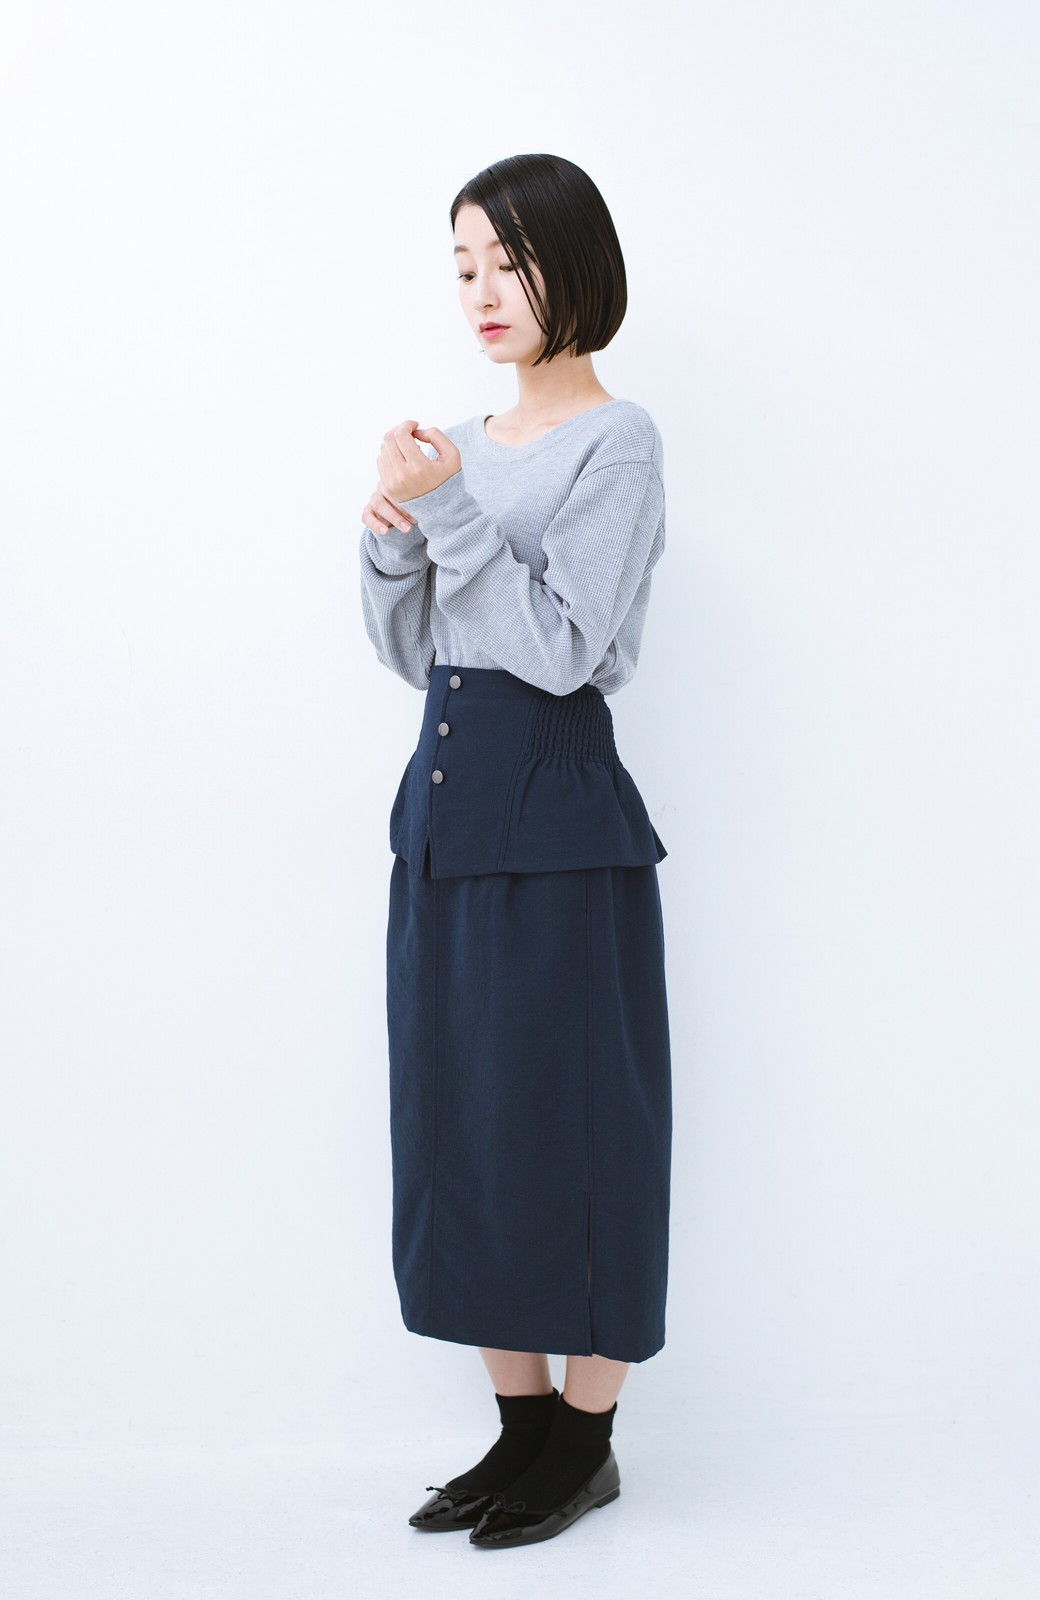 haco!  腹巻きとは呼ばせない ブルー期も華やかに過ごせる消臭加工裏地付きフリルデザインスカートセット【ブルー期】女の子バンザイ!プロジェクト <ネイビー>の商品写真19